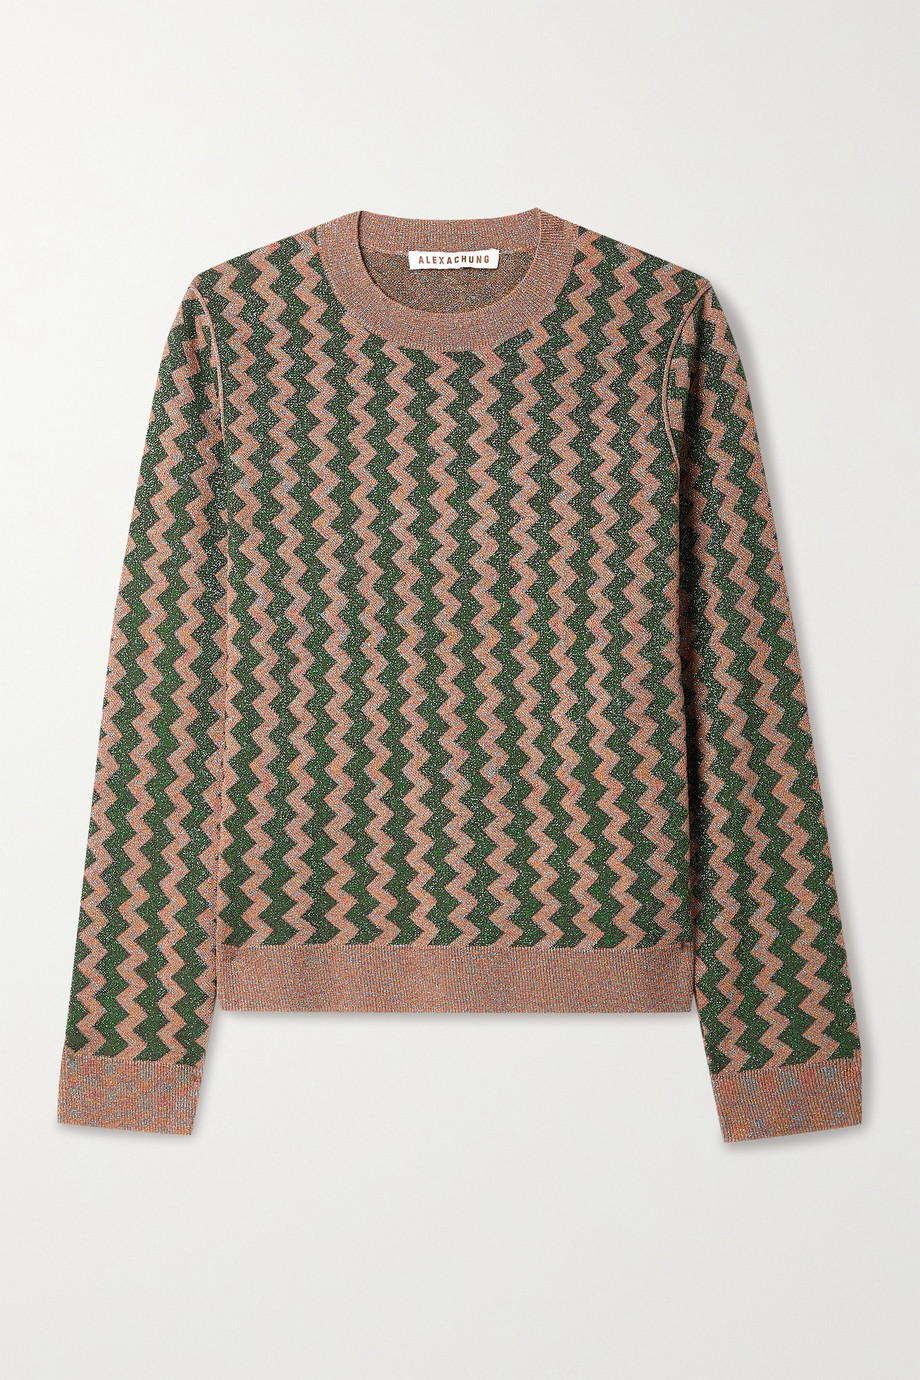 ALEXACHUNG Striped Lurex sweater